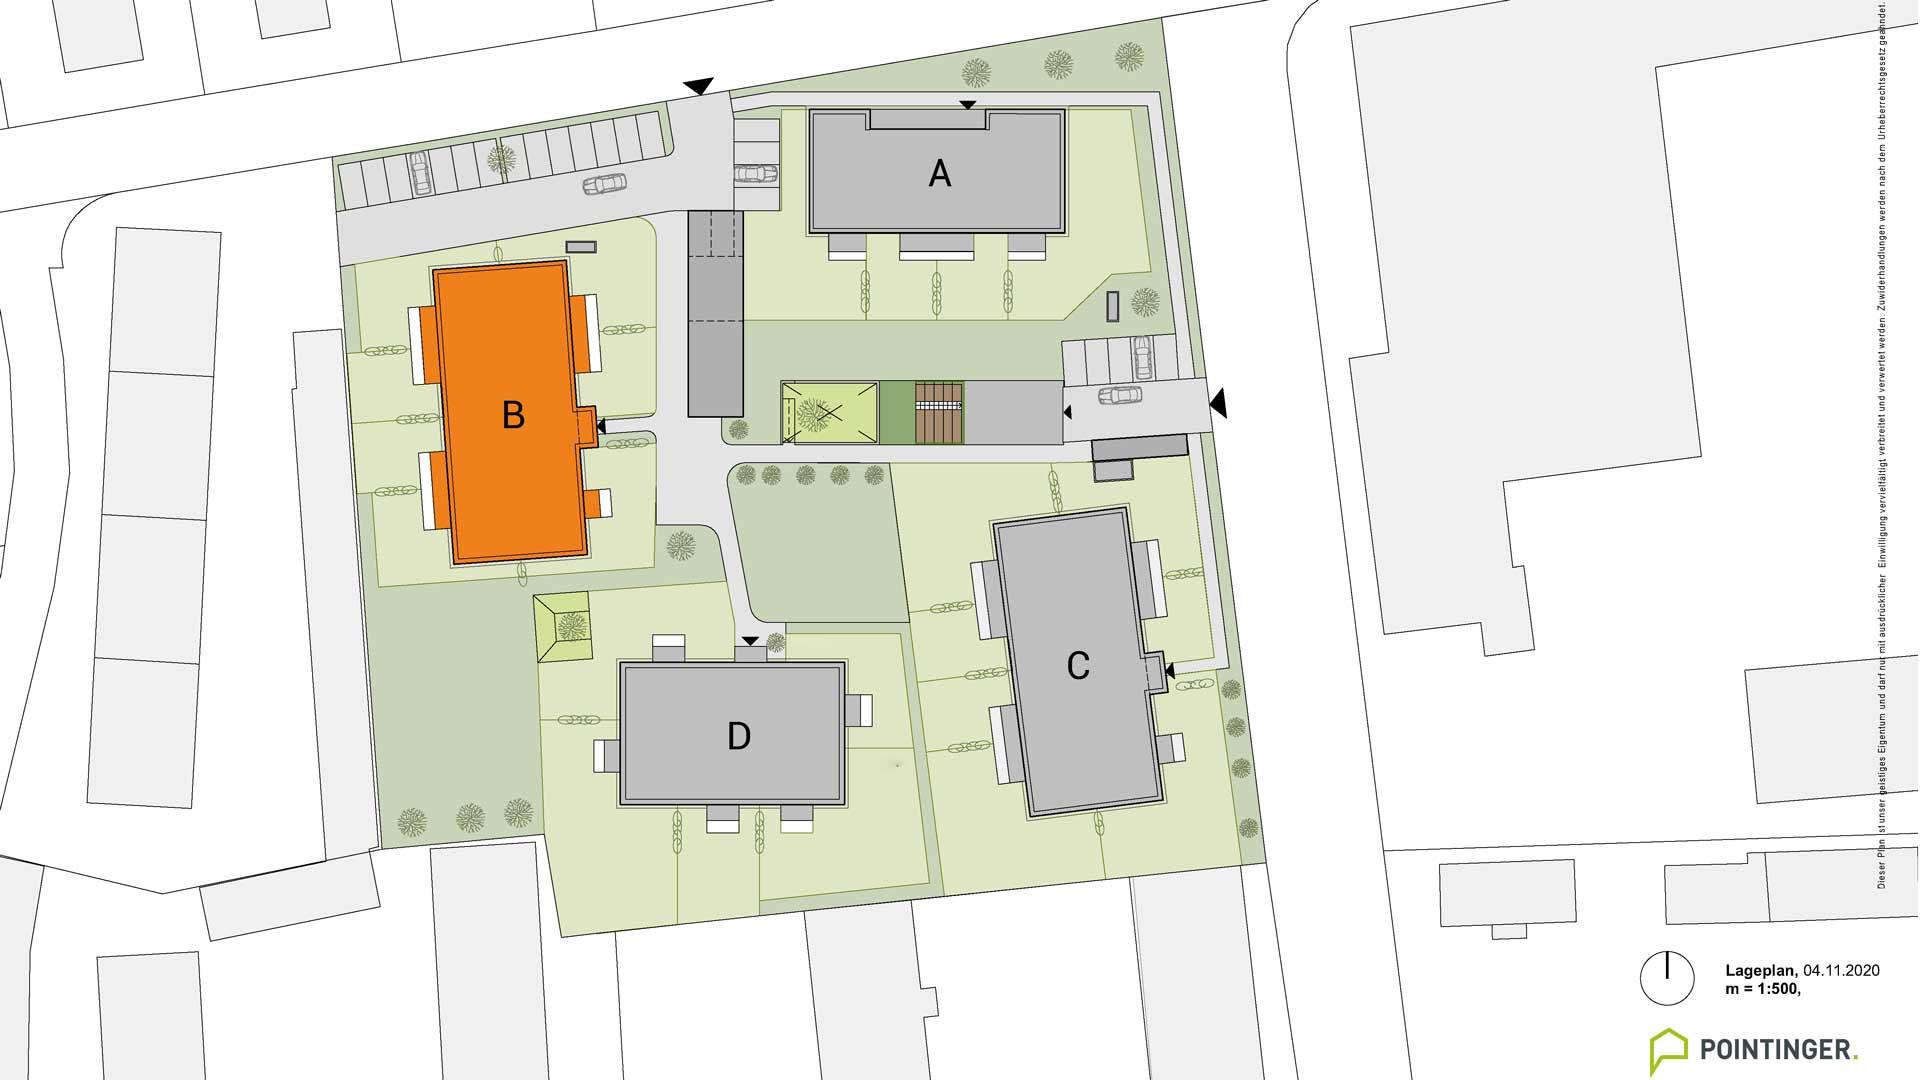 all-in99 Projekt Villach Lageplan Bauteil B orange markiert